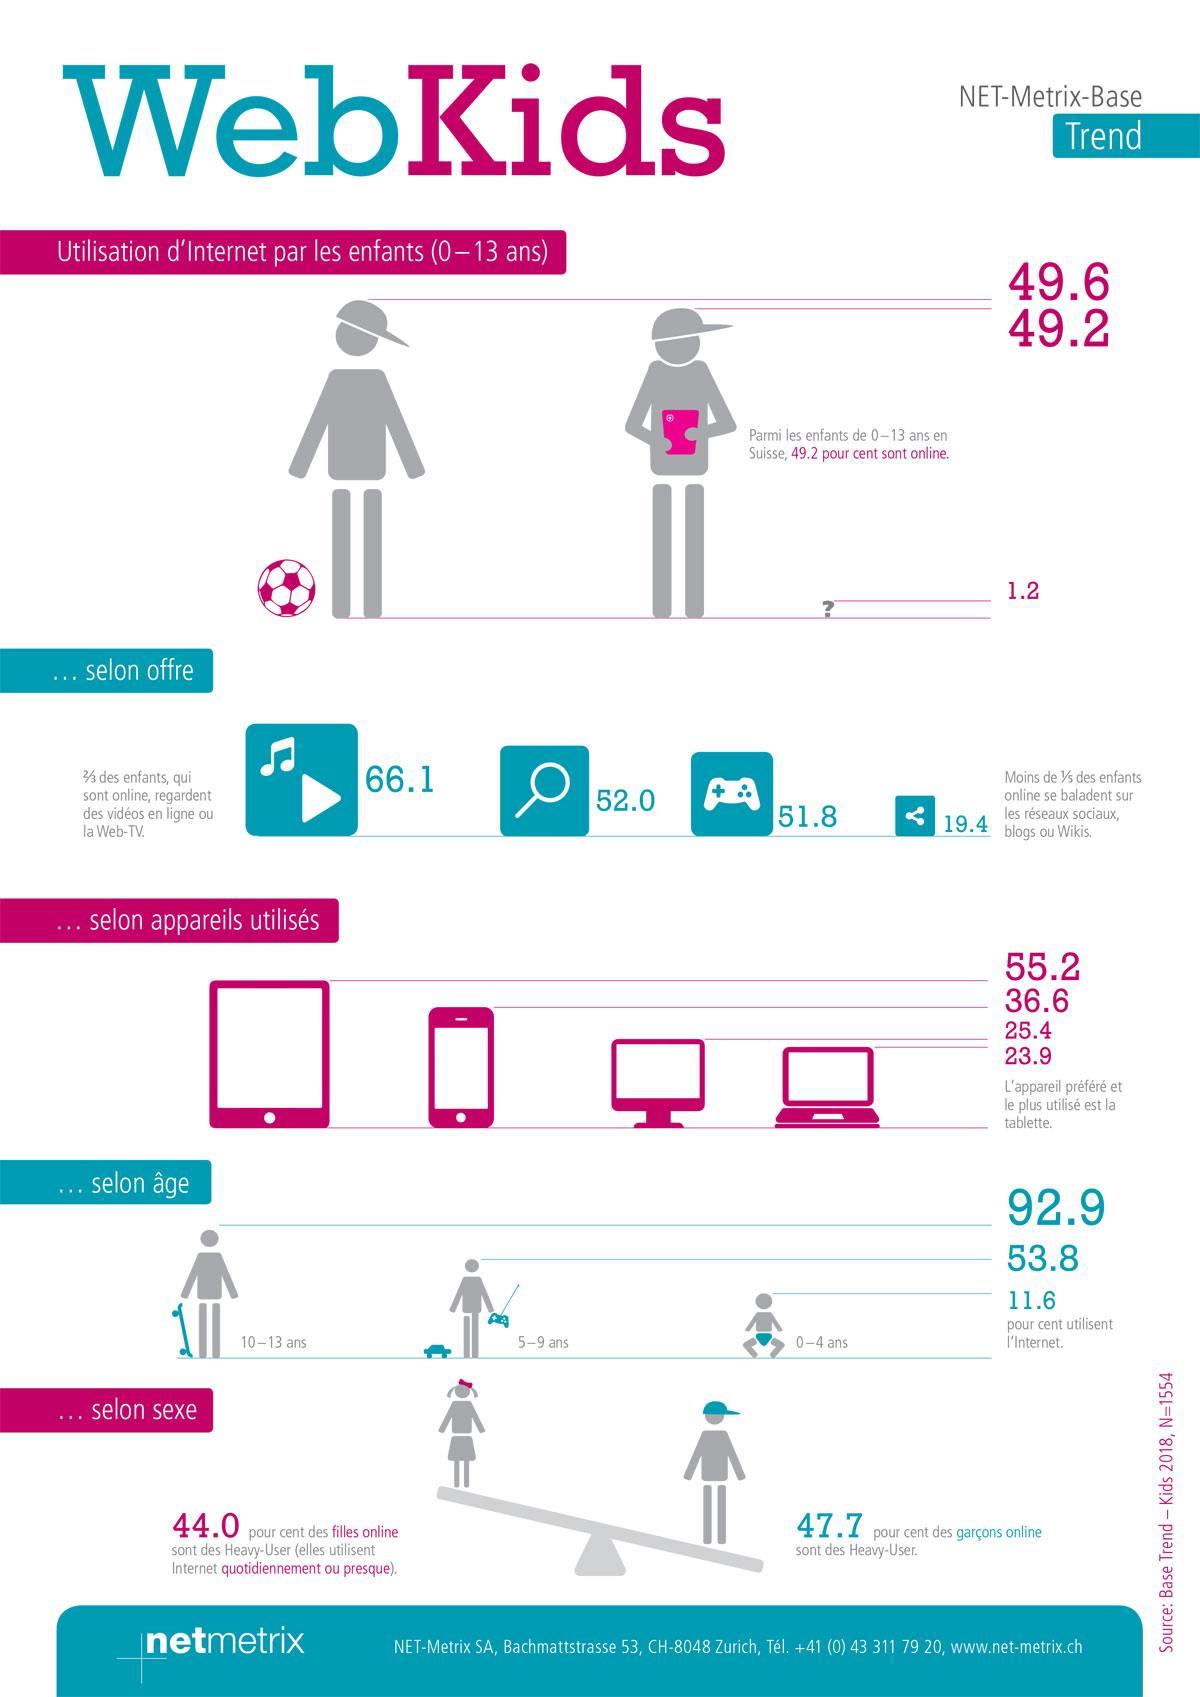 WebKids: l'infographie de Net-Metrix.